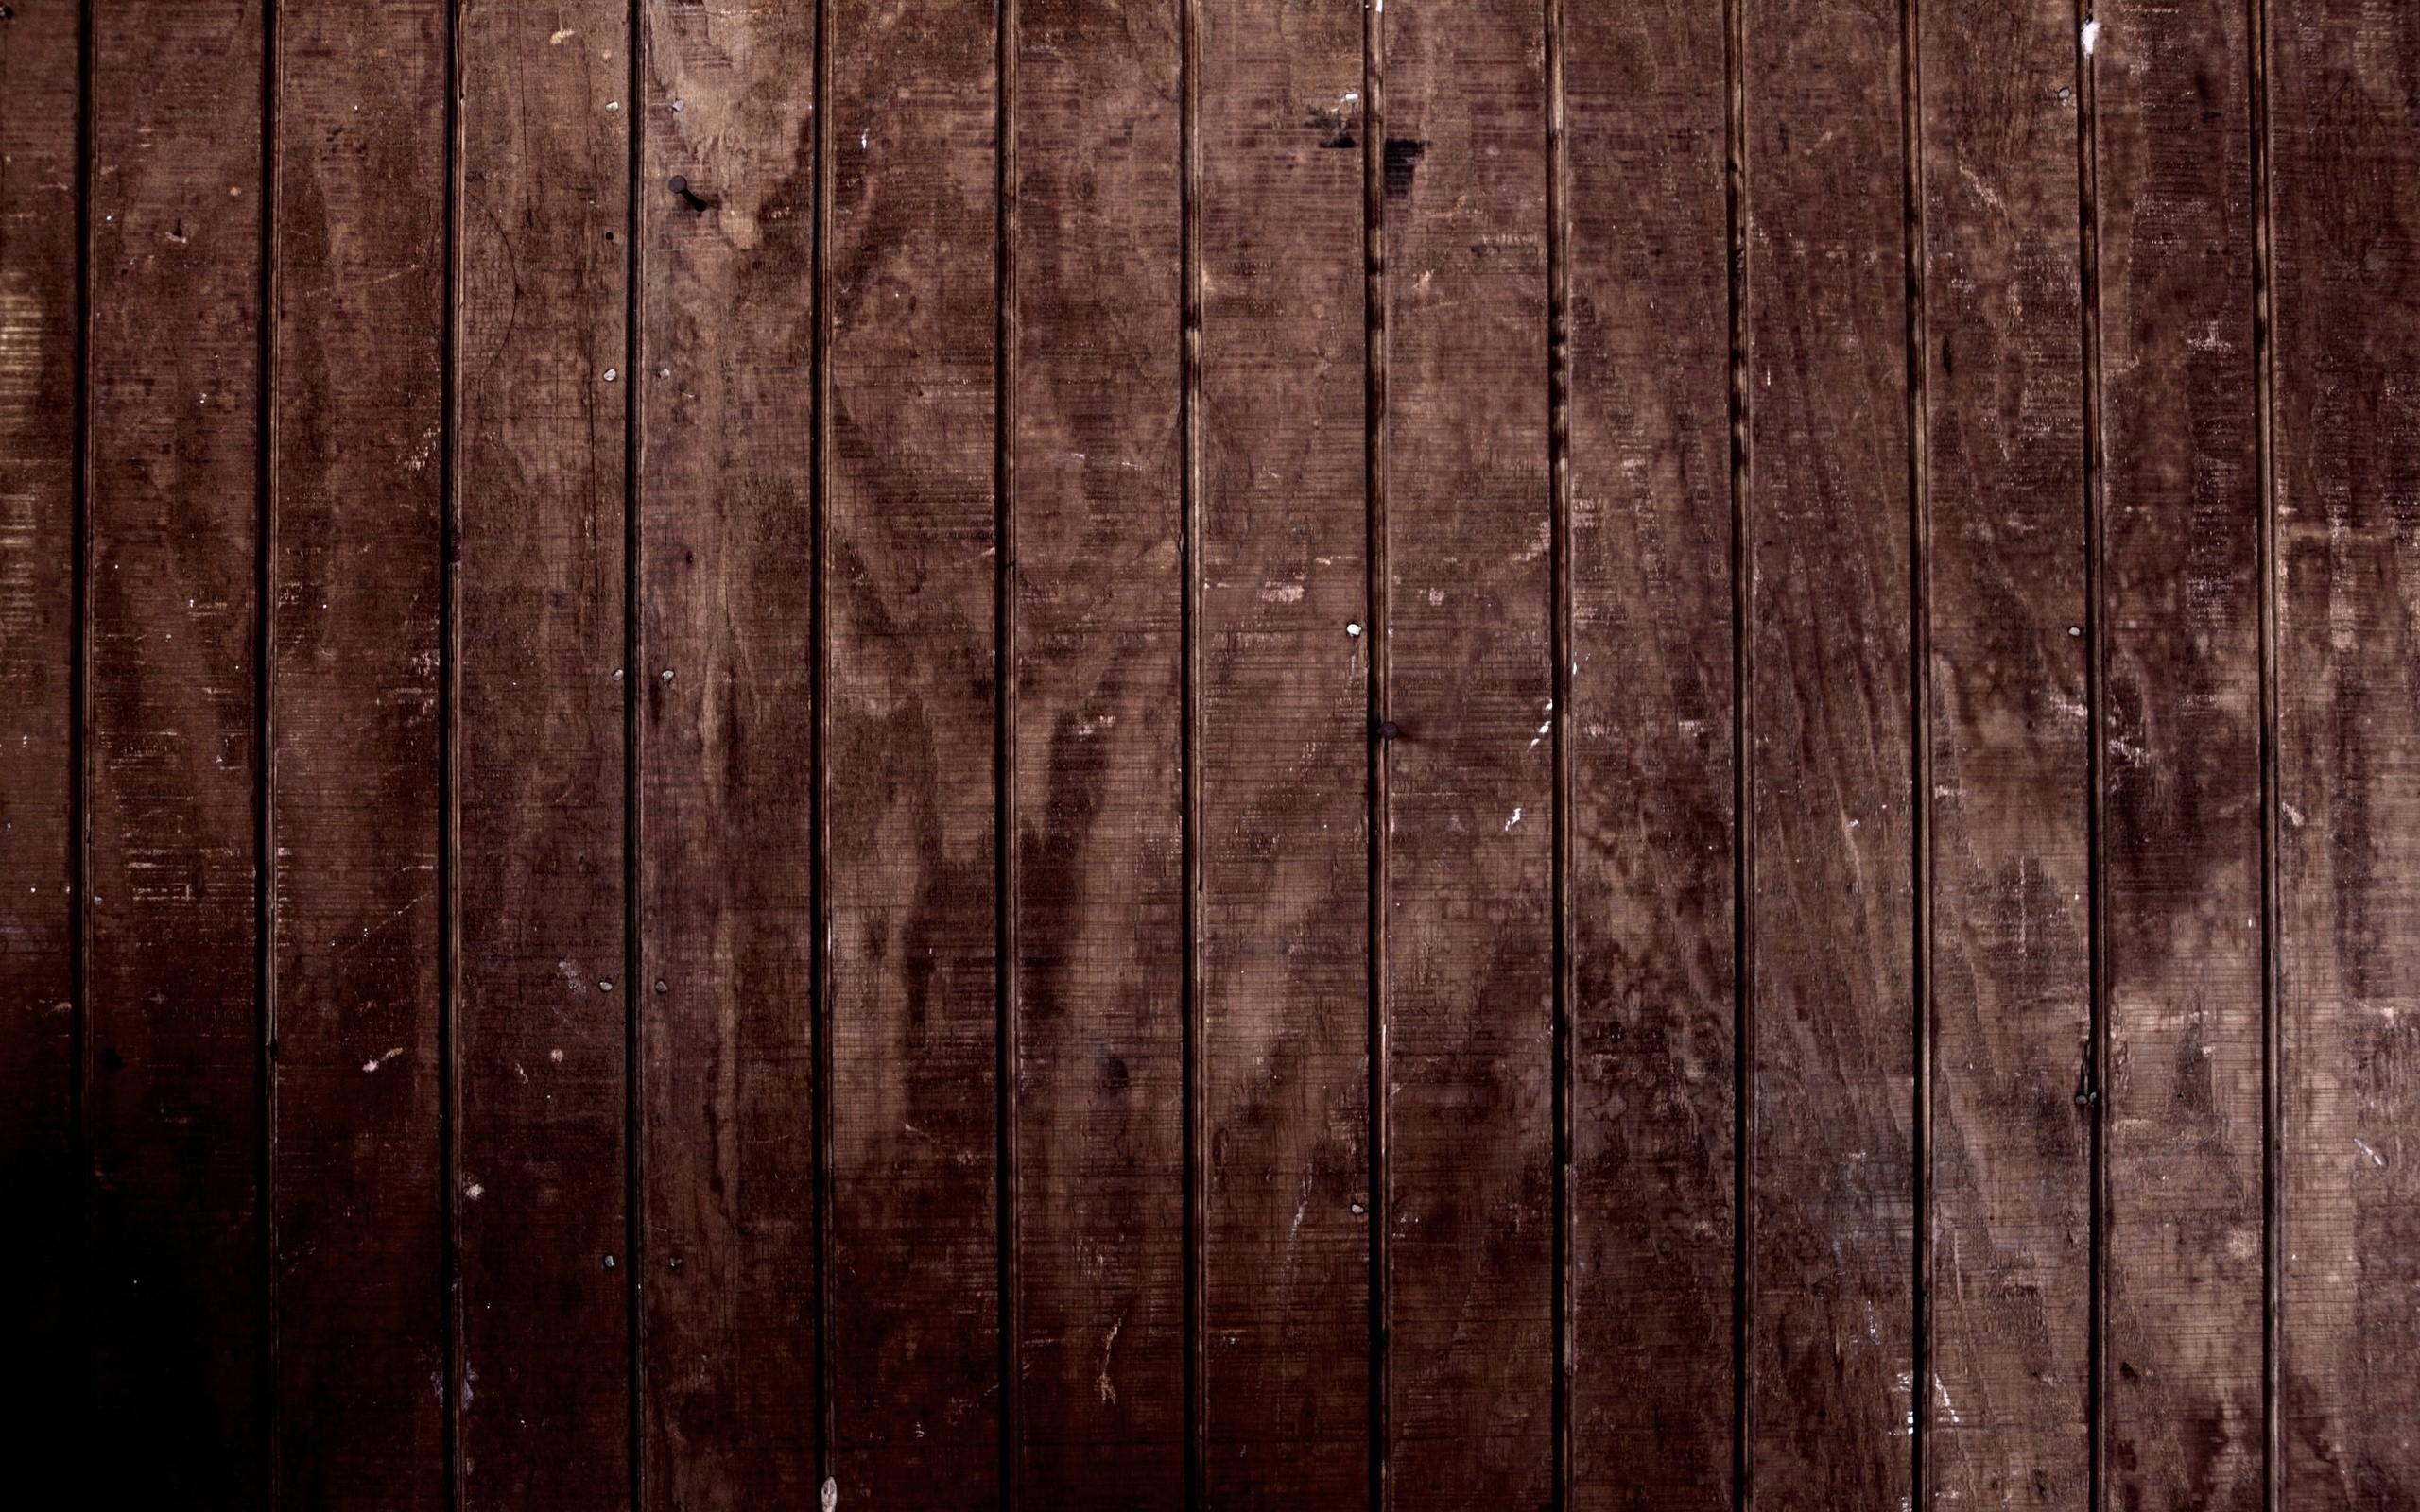 Wood wall textures macro wallpaper | 2560x1600 | 19766 ...